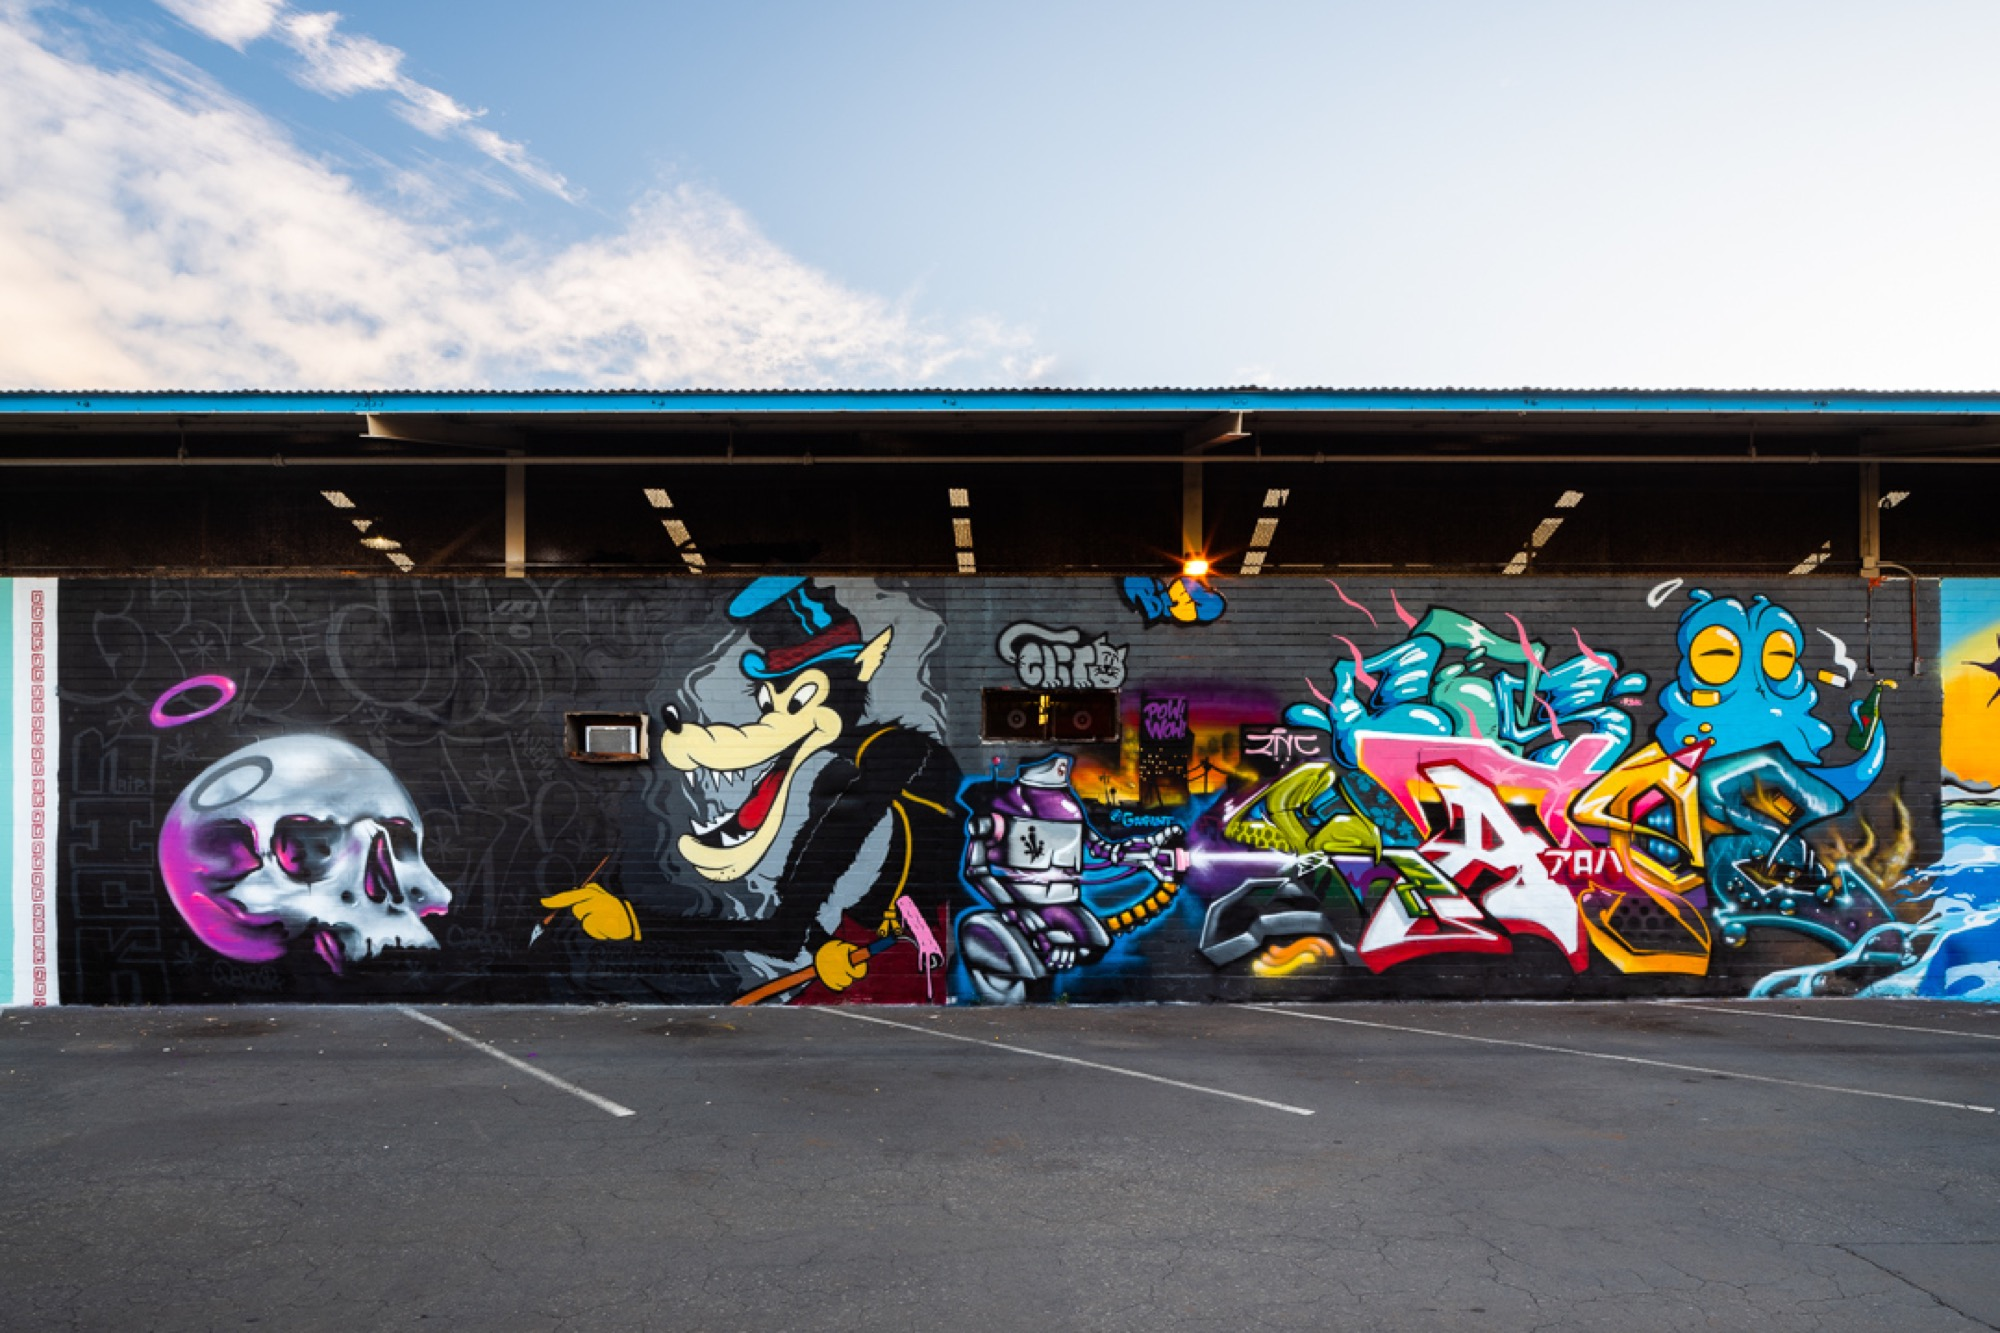 Recap: POW! WOW! Hawaii 2019 Artes & contextos pwh2019 Grace Jihad Katoe bshigeta